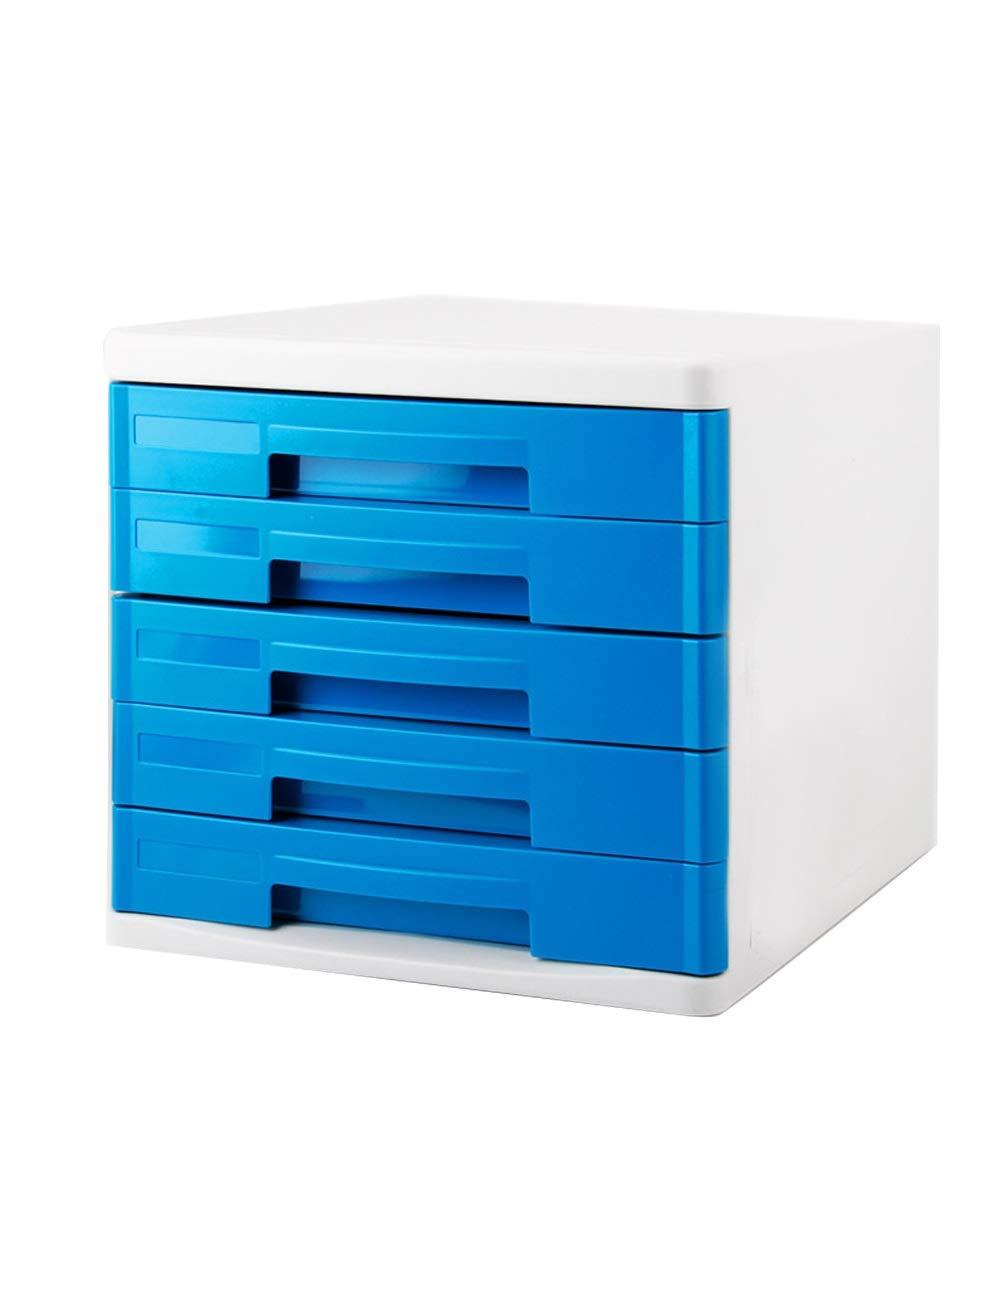 File Cabinets Office Desktop Cabinet 4 Drawers 26.33425(cm) Plastic Safety Cabinet File Storage Cabinet Storage Box Home Office Furniture by File Cabinets